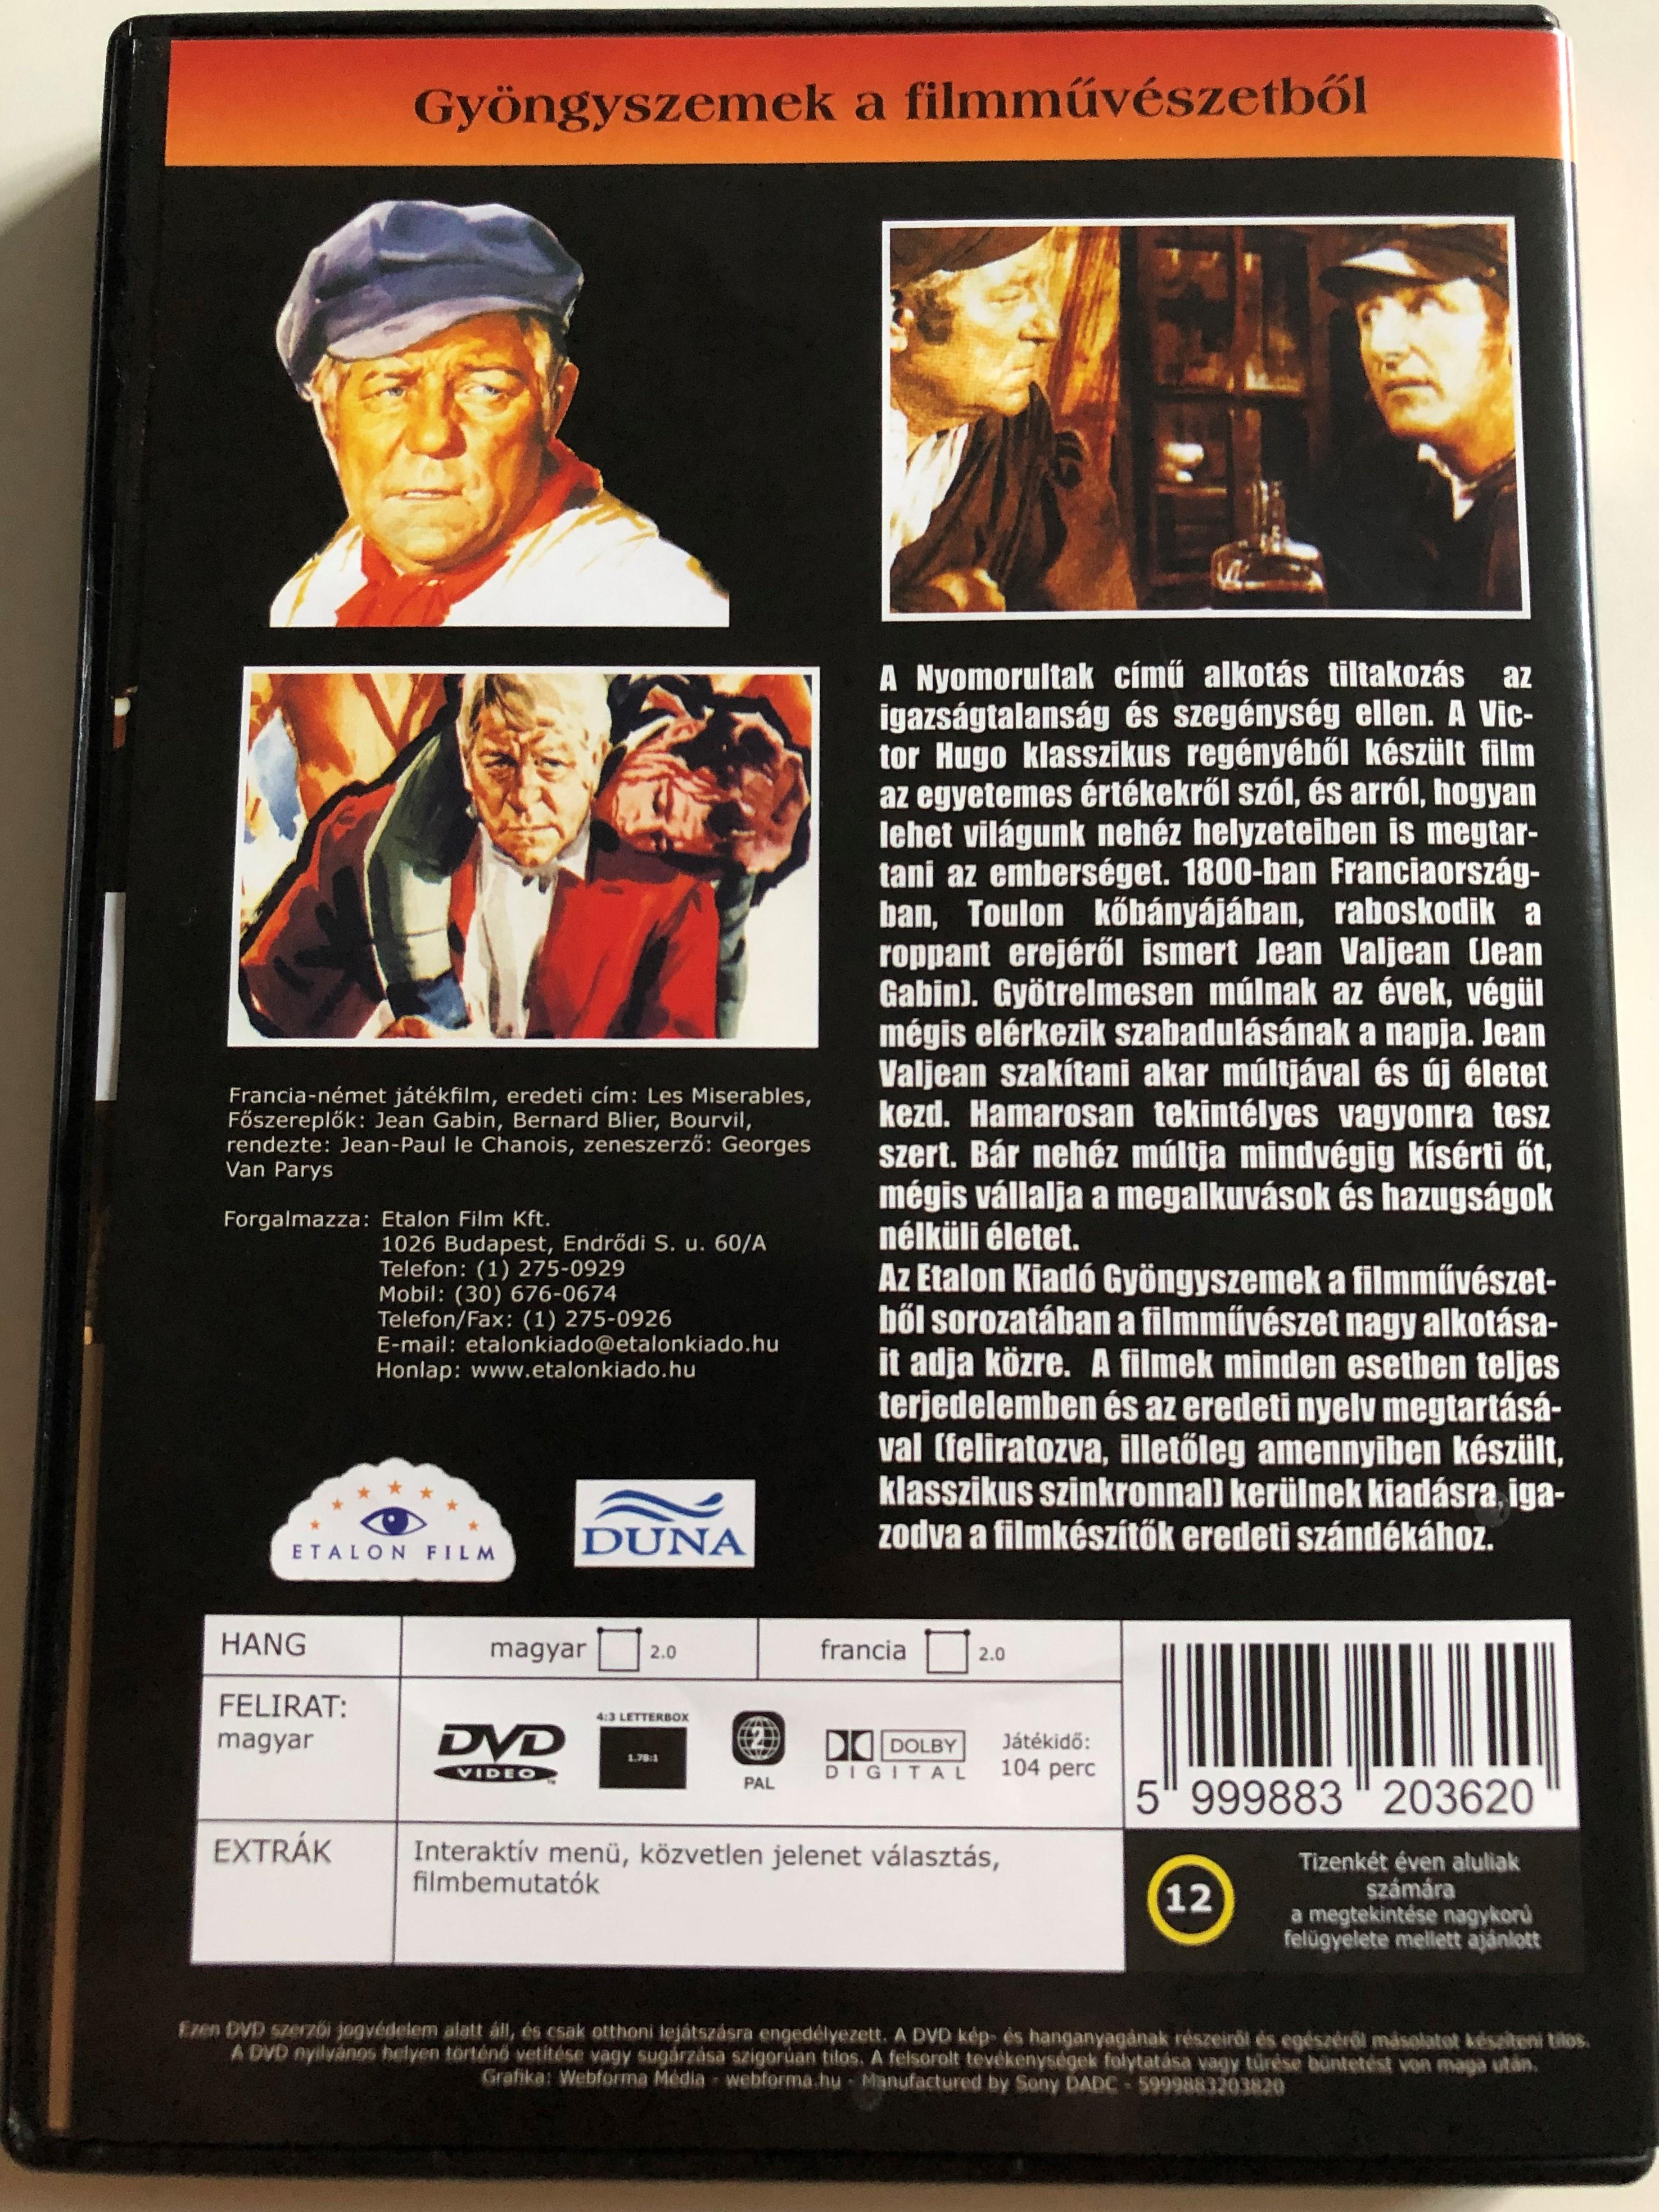 les-miserables-ii.-dvd-1958-a-nyomorultak-ii.-r-sz-directed-by-jean-paul-le-chanois-starring-jean-gabin-bernart-blier-bourvil-gy-ngyszemek-a-filmm-v-szetb-l-based-on-victor-hugo-s-novel-2-.jpg